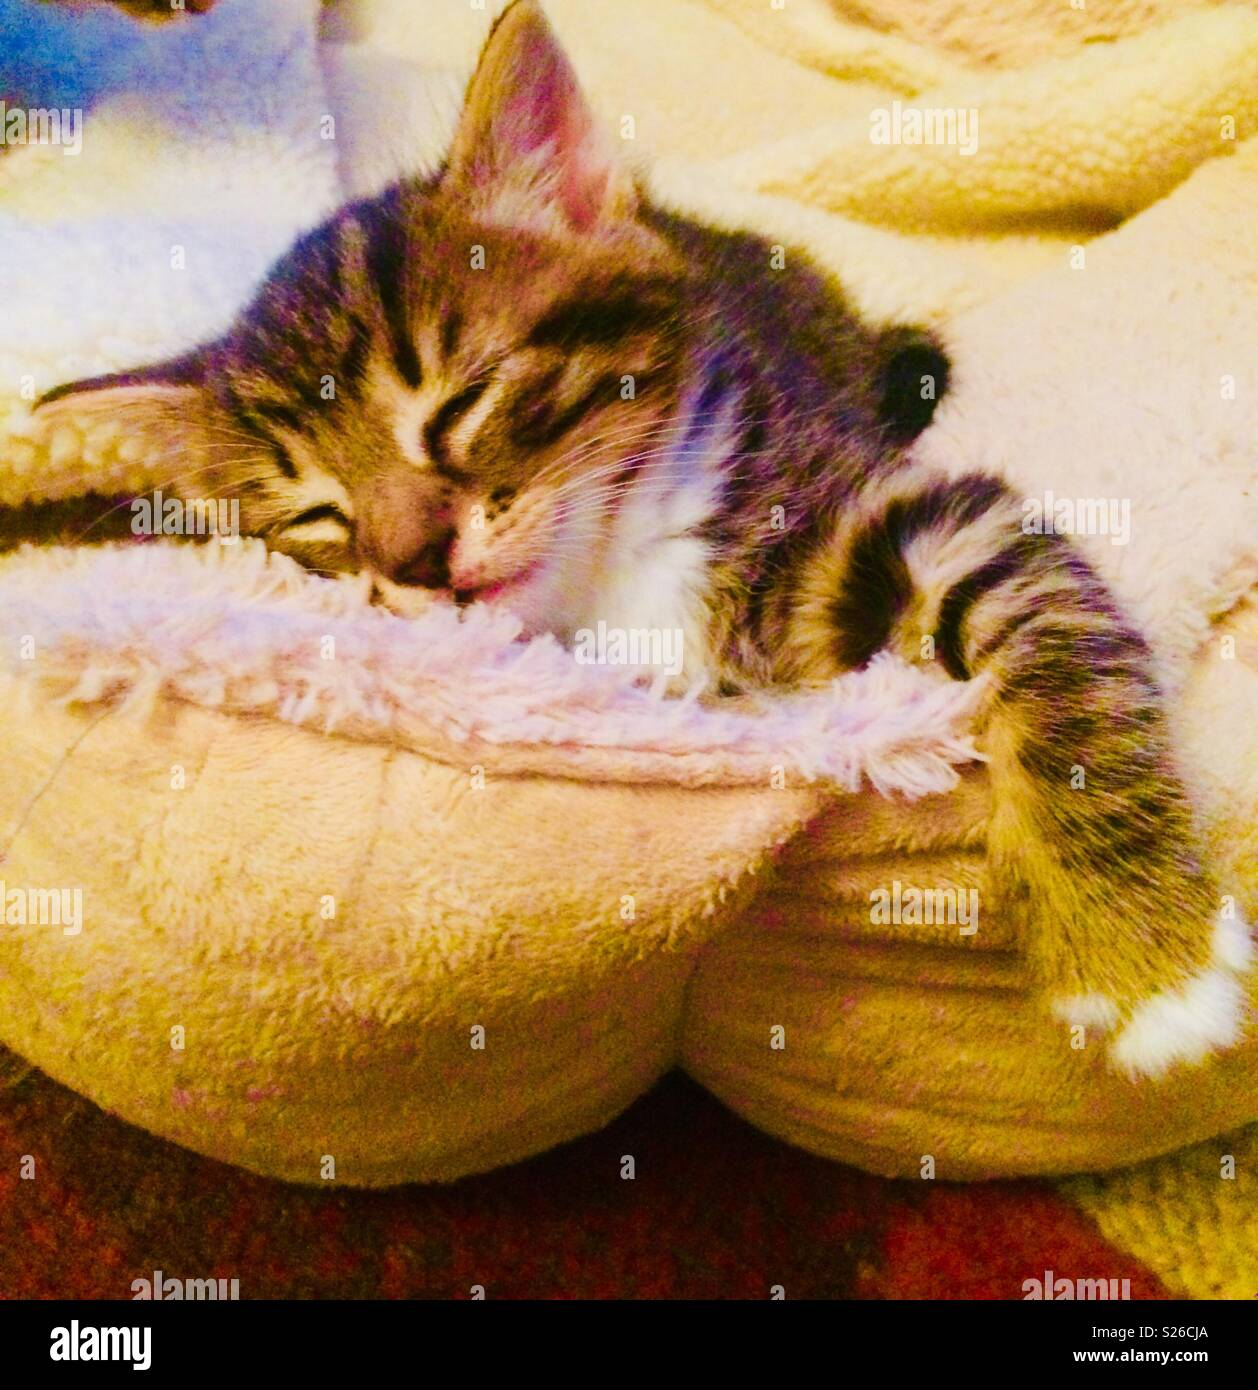 Sleeping cute Tabbie Kitten in dogs comfy bed - Stock Image